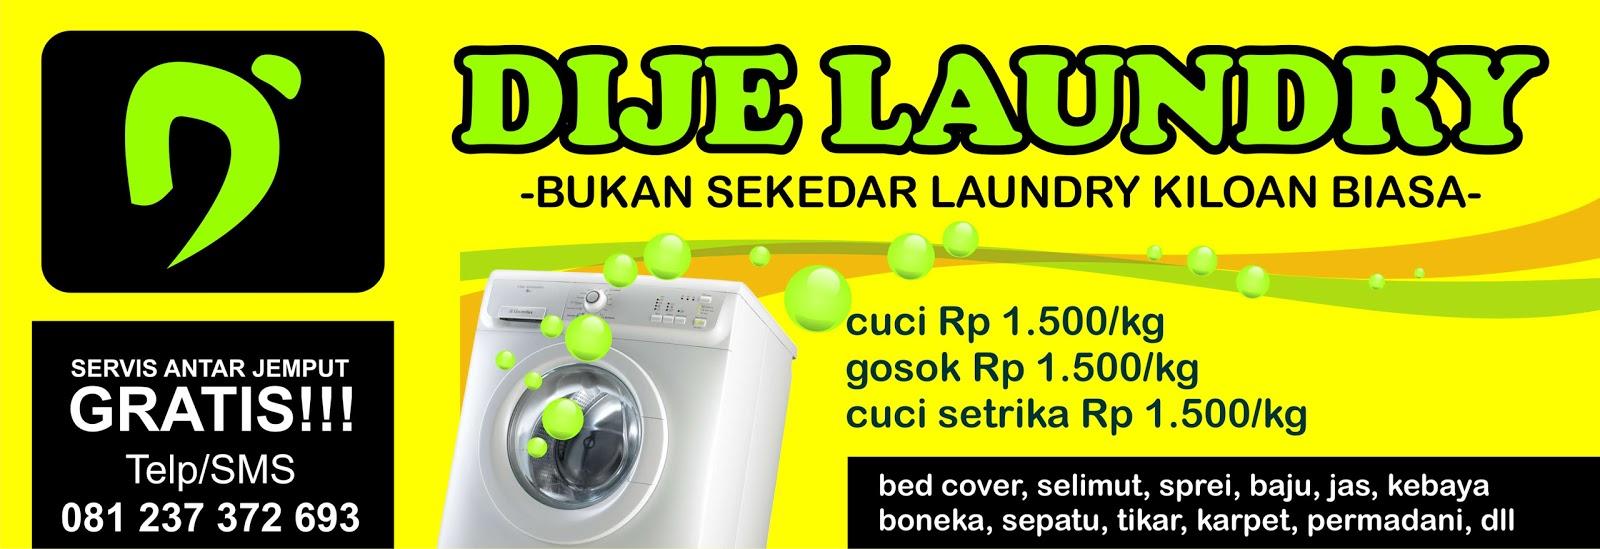 Spanduk DIJE Laundry Sleman